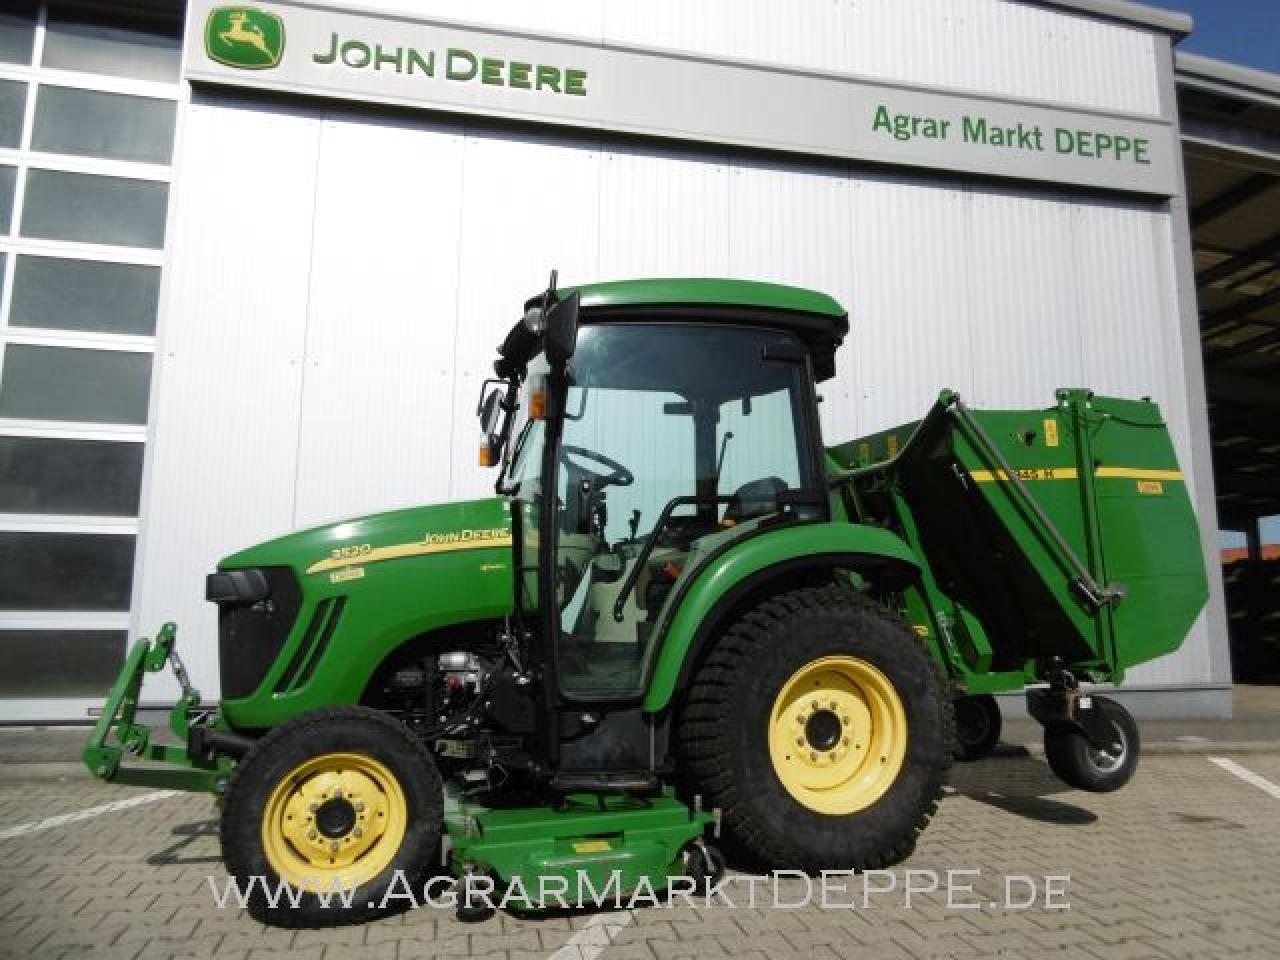 John Deere 3520